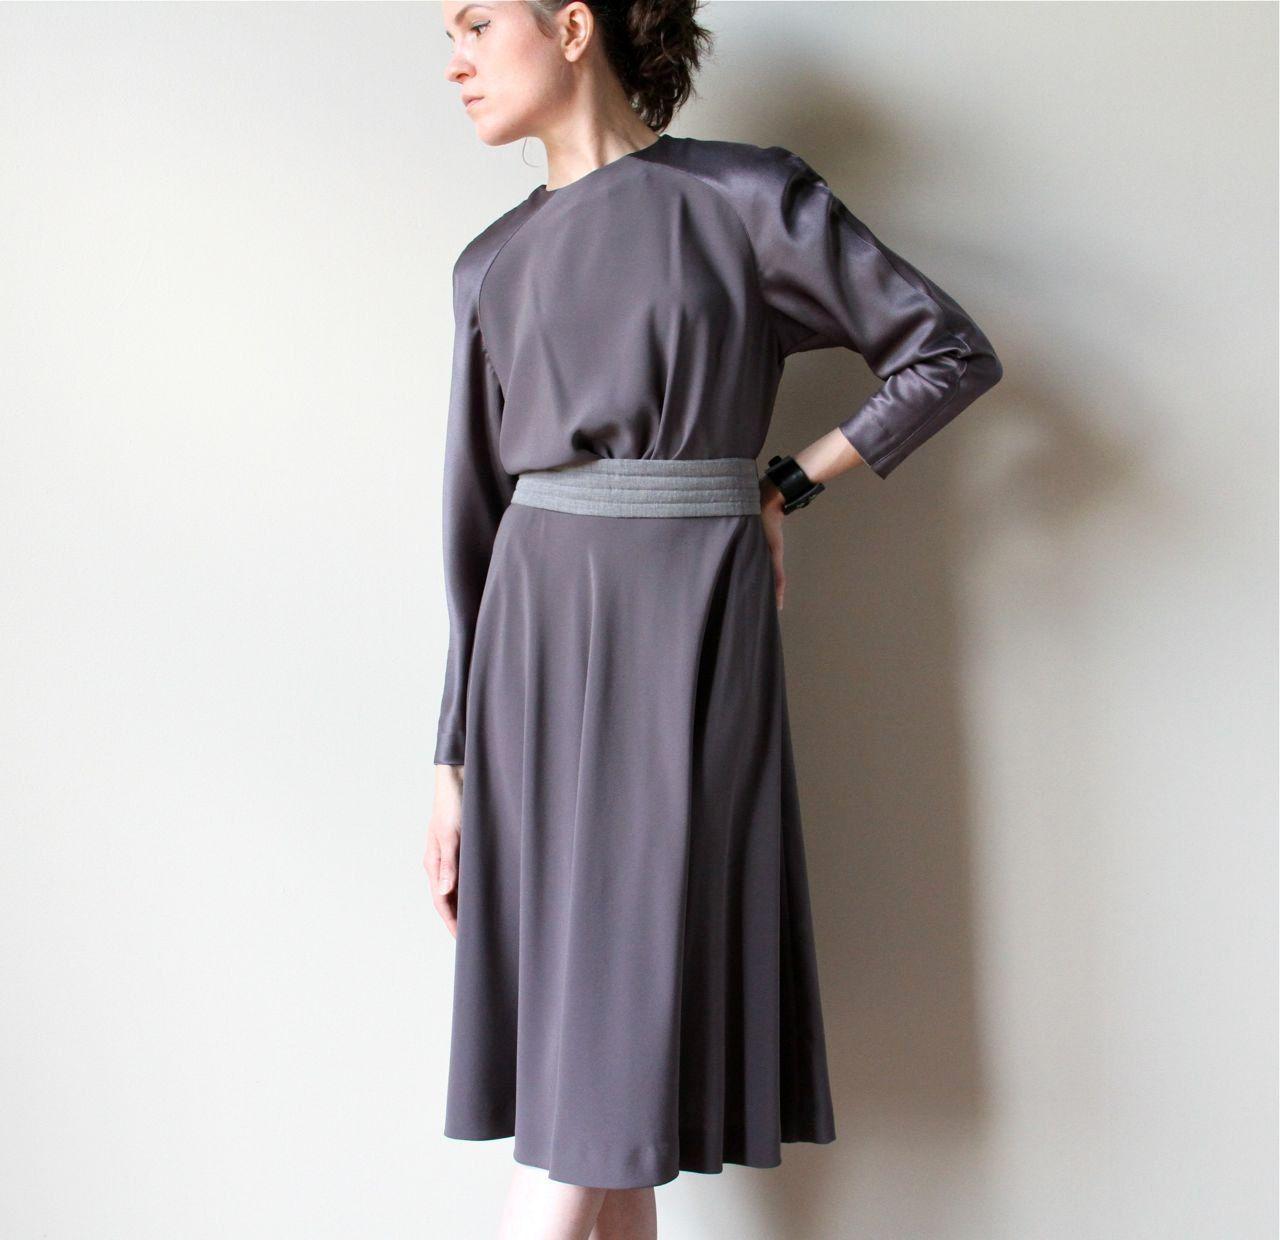 Dove Grey Minimalist Dress 80s 90s Designer Office Fashion Full Circle Skirt Slate Ash Smoke Monochrome Party Frock Minimalist Dresses Grey Silk Dress Dresses